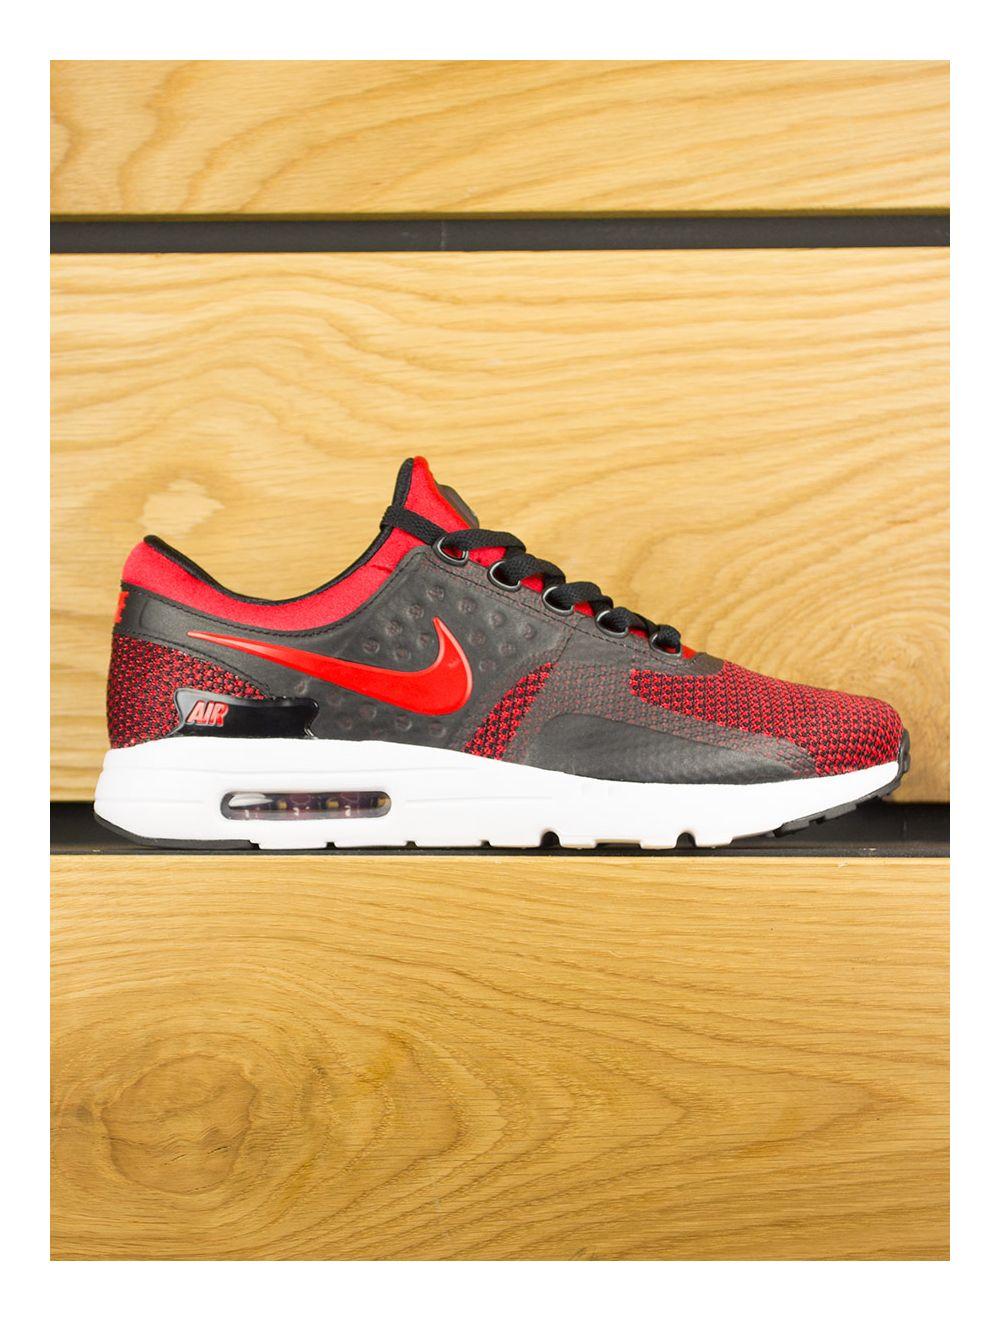 best service 74689 13441 Nike Air Max Zero - Bred University Red Black